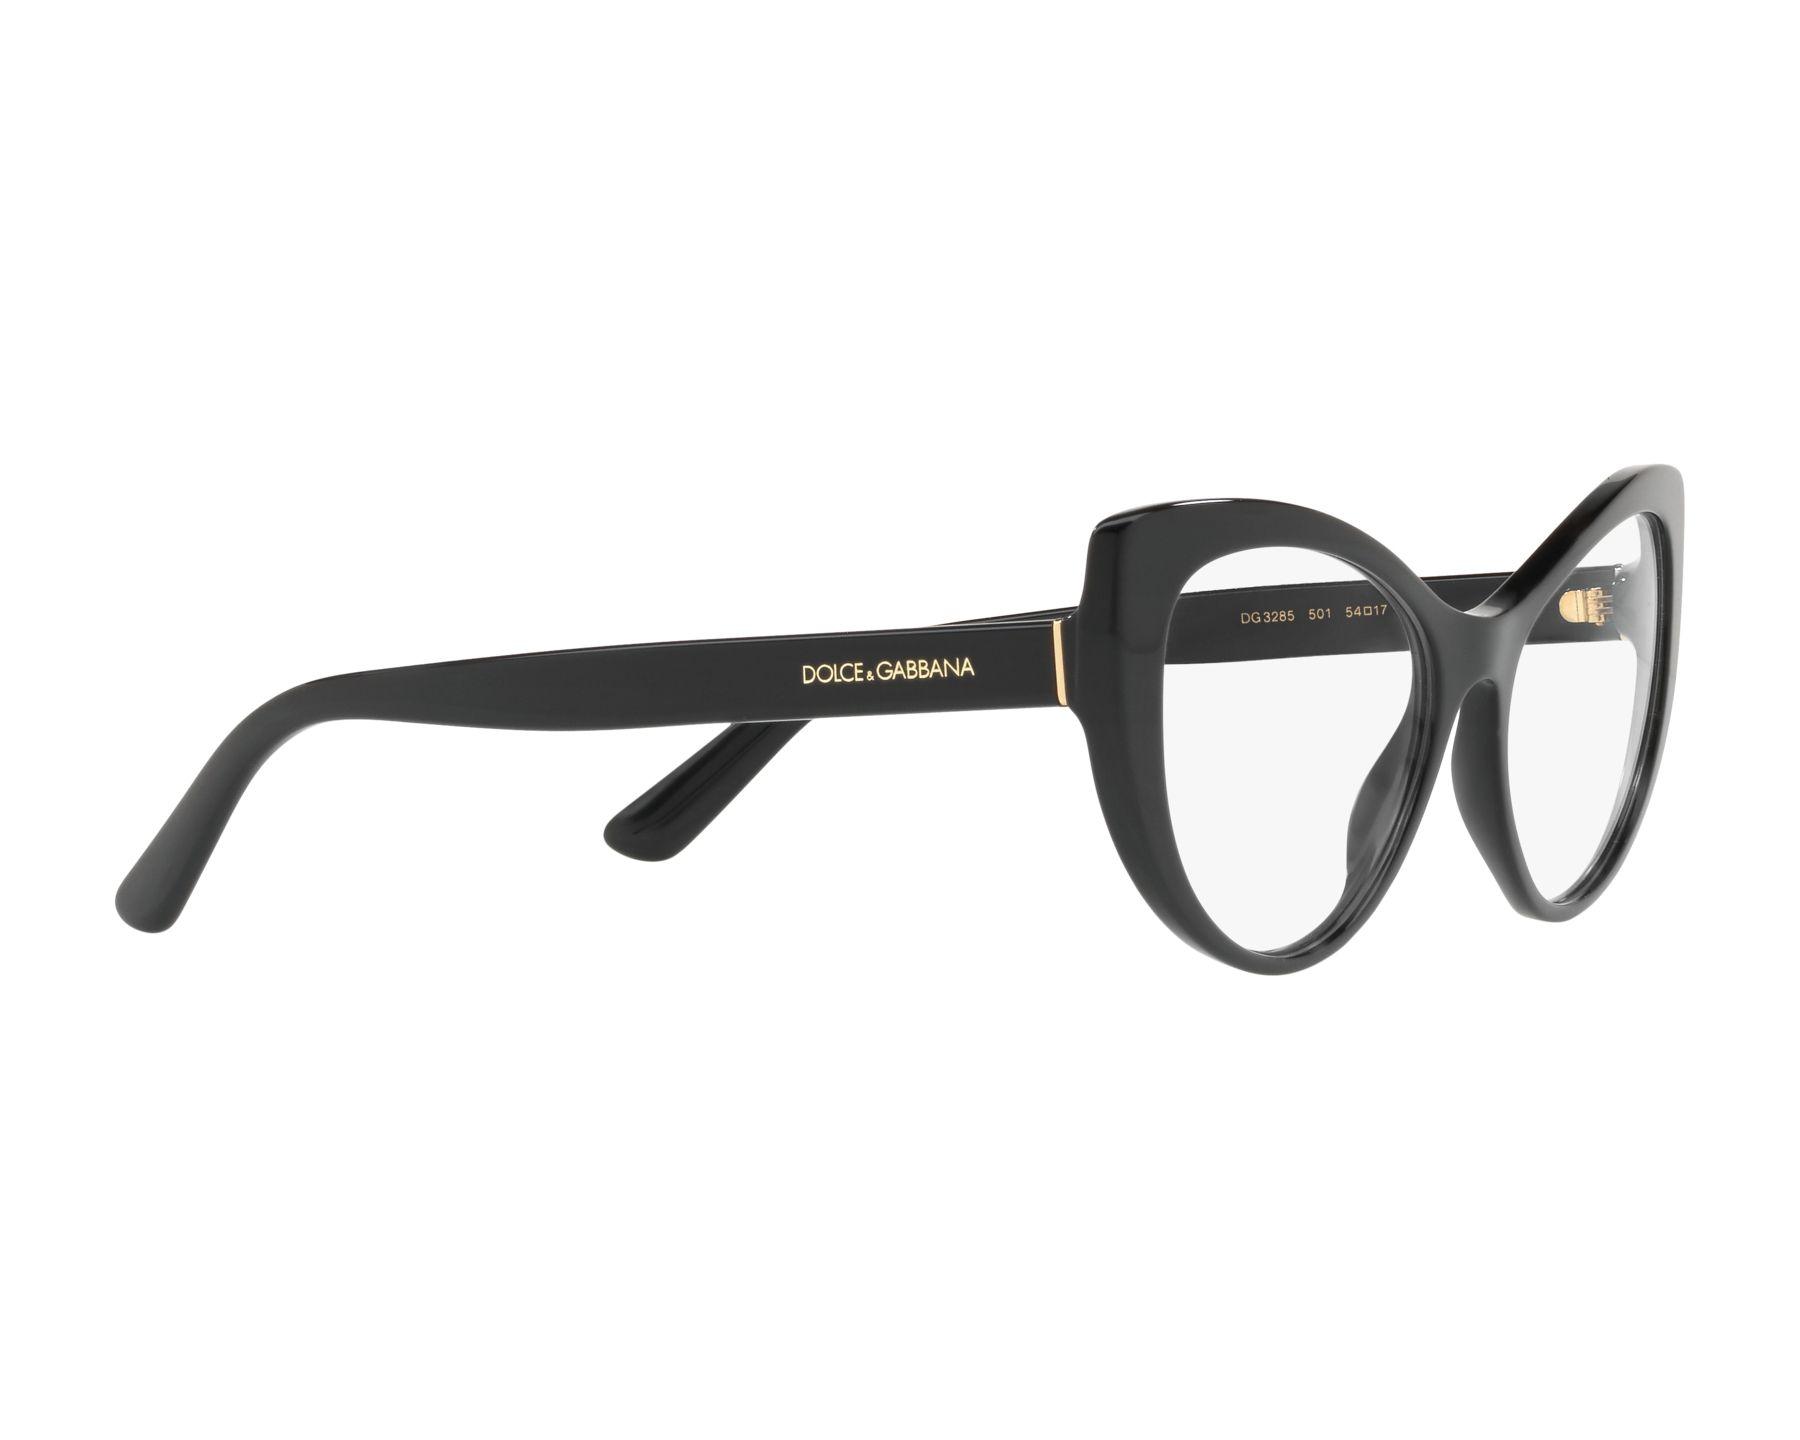 e6b1623b8738 eyeglasses Dolce   Gabbana DG-3285 501 52-17 Black 360 degree view 11